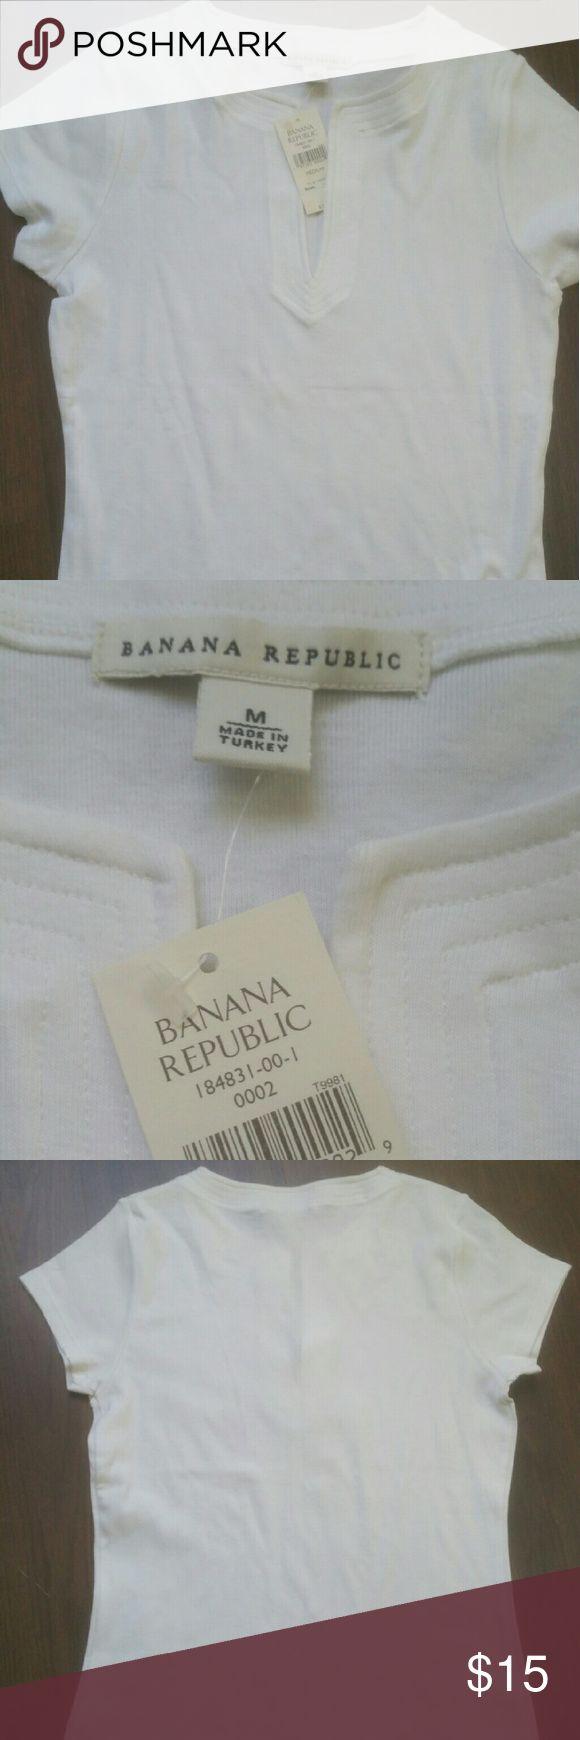 Banana republic tshirt Banana Republic t-shirt.  White short sleeve, size medium. Banana Republic Tops Tees - Short Sleeve